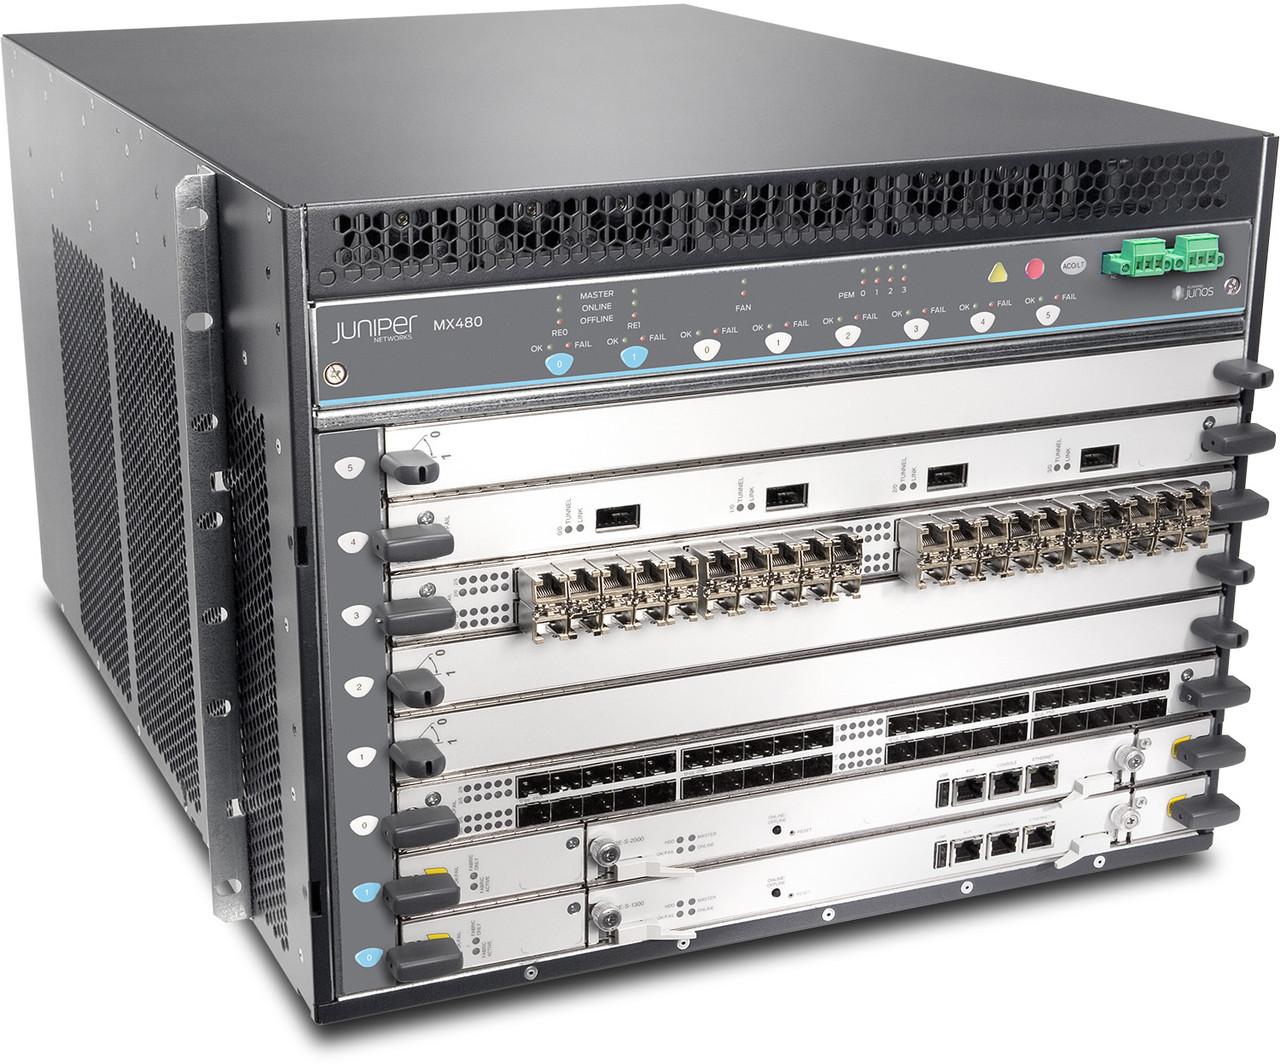 Маршрутизатор Juniper MX480 bundle